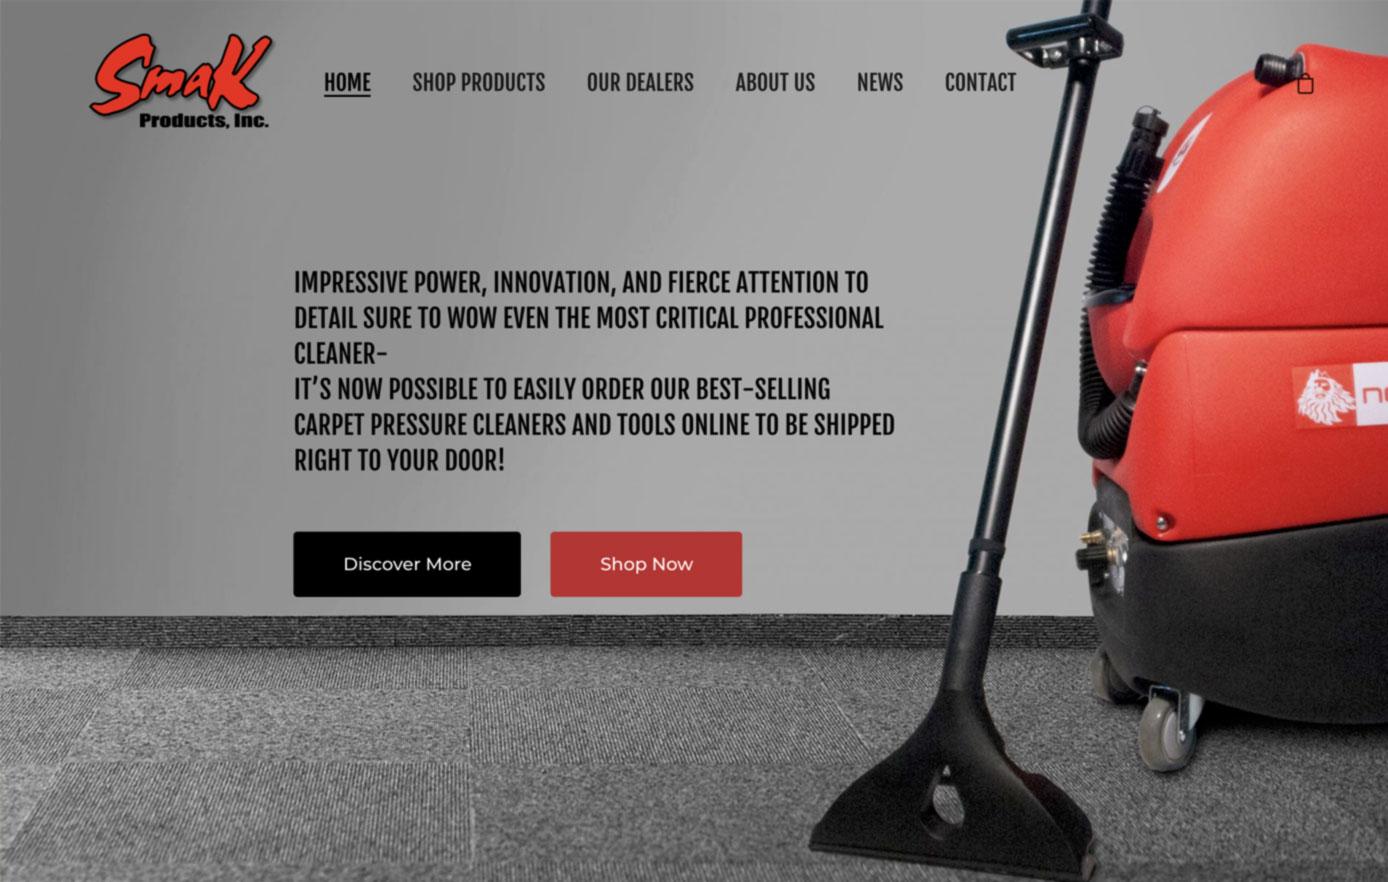 smak products, website design, ecommerce website design